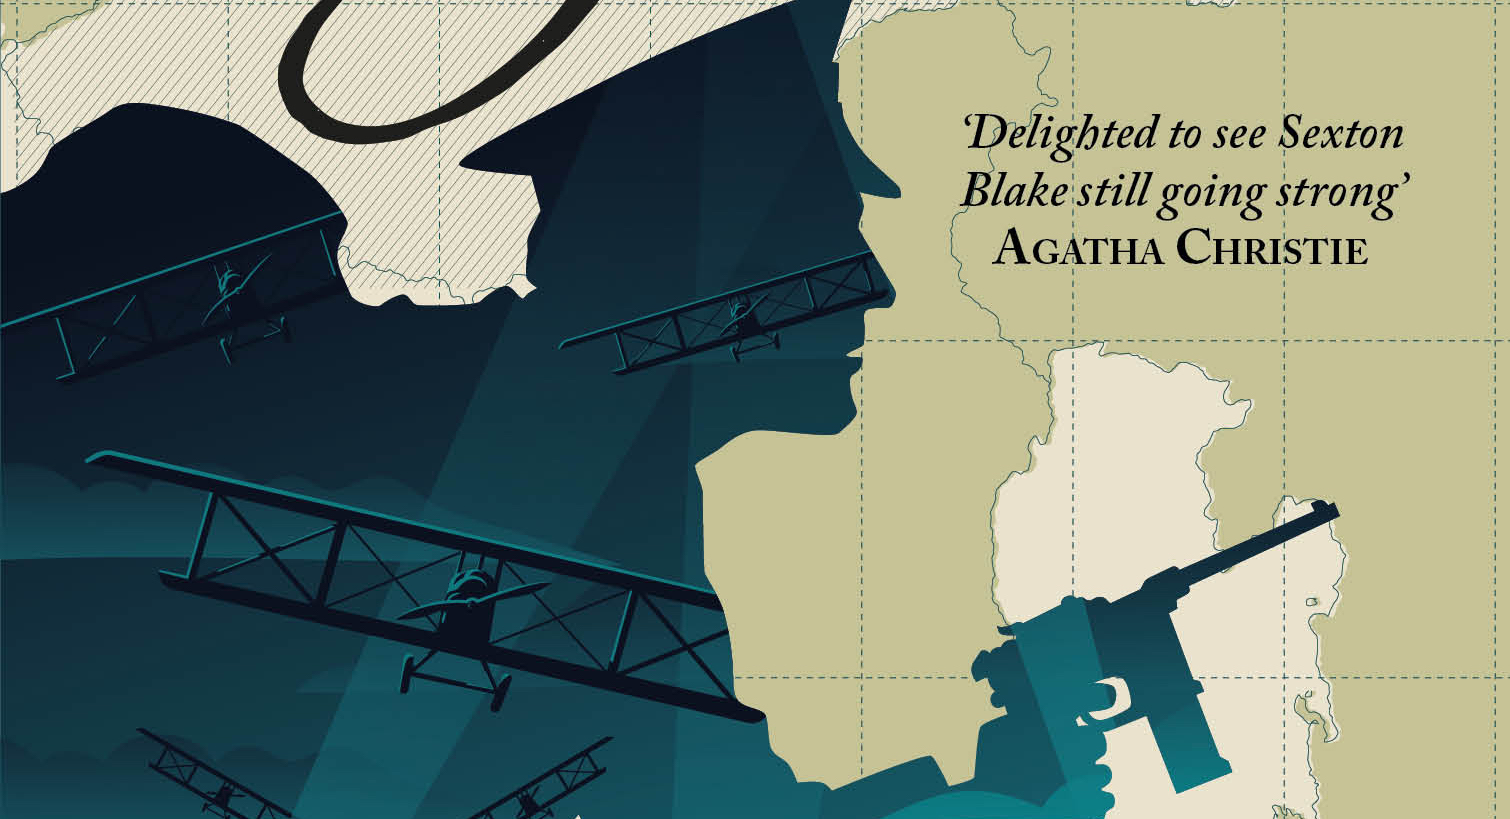 Rebellion announces the return of literary detective Sexton Blake in 2020